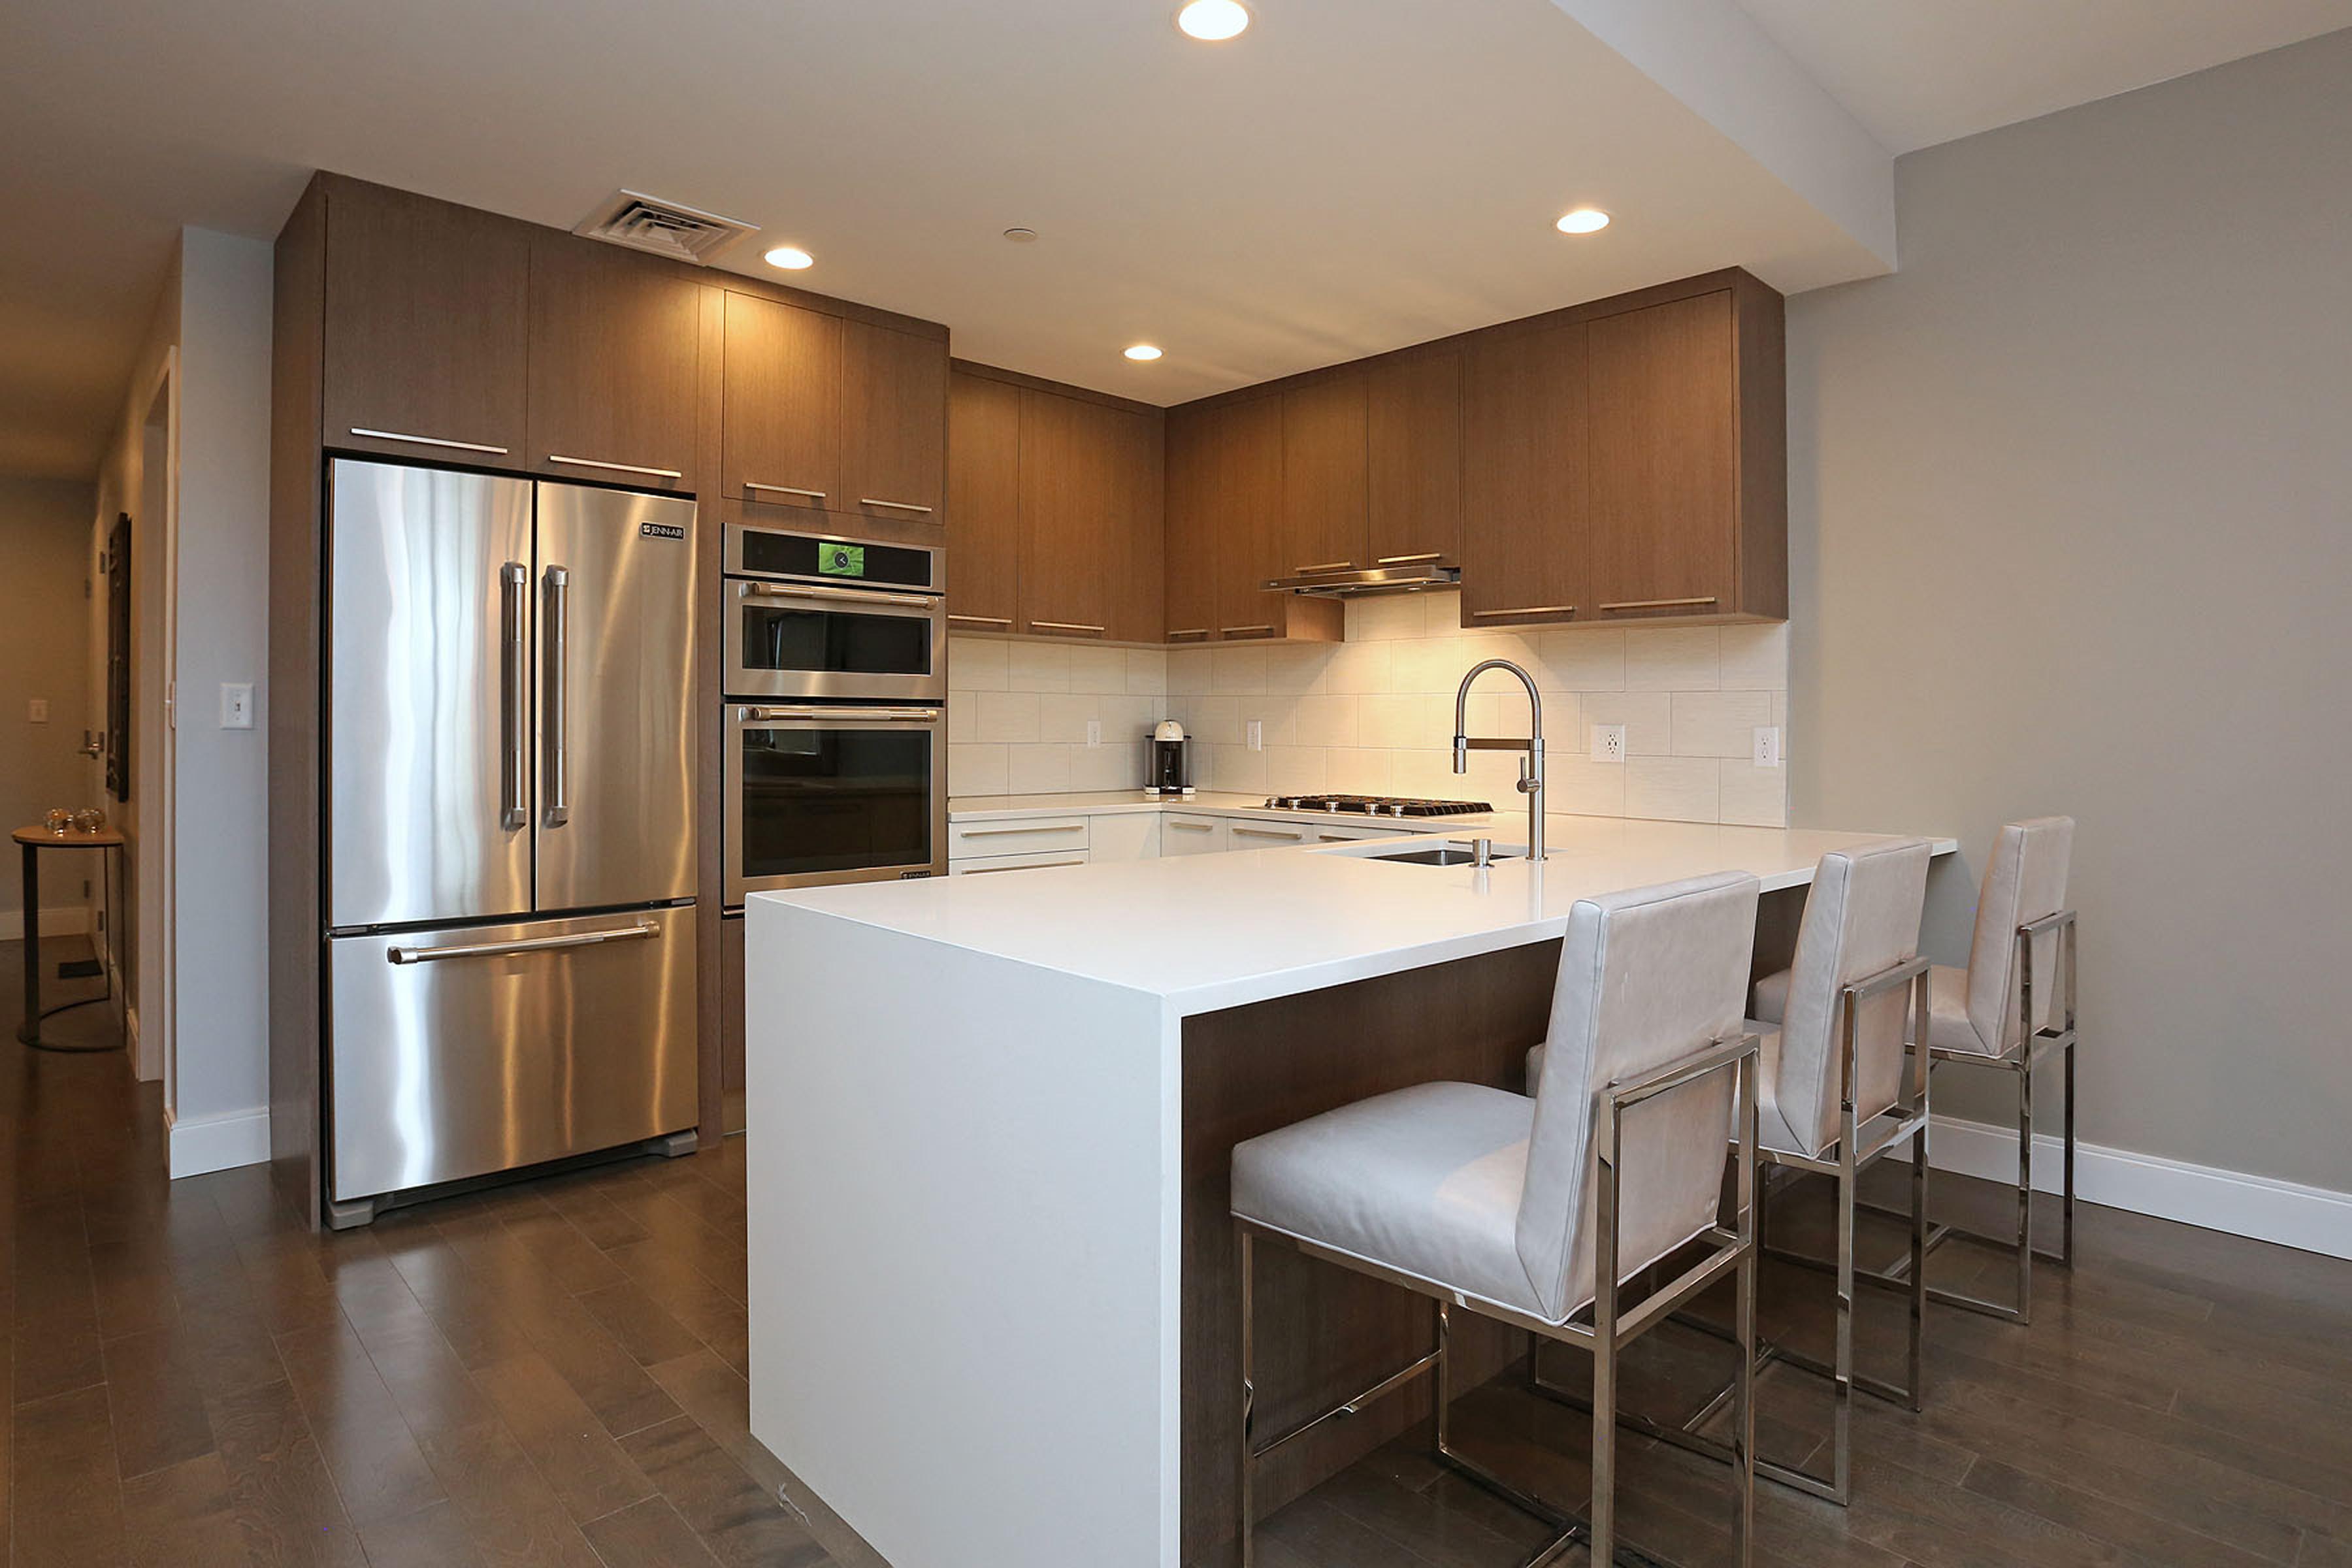 Condominium for Sale at Allele 150 Dorchester Ave Unit 511 Boston, Massachusetts, 02127 United States